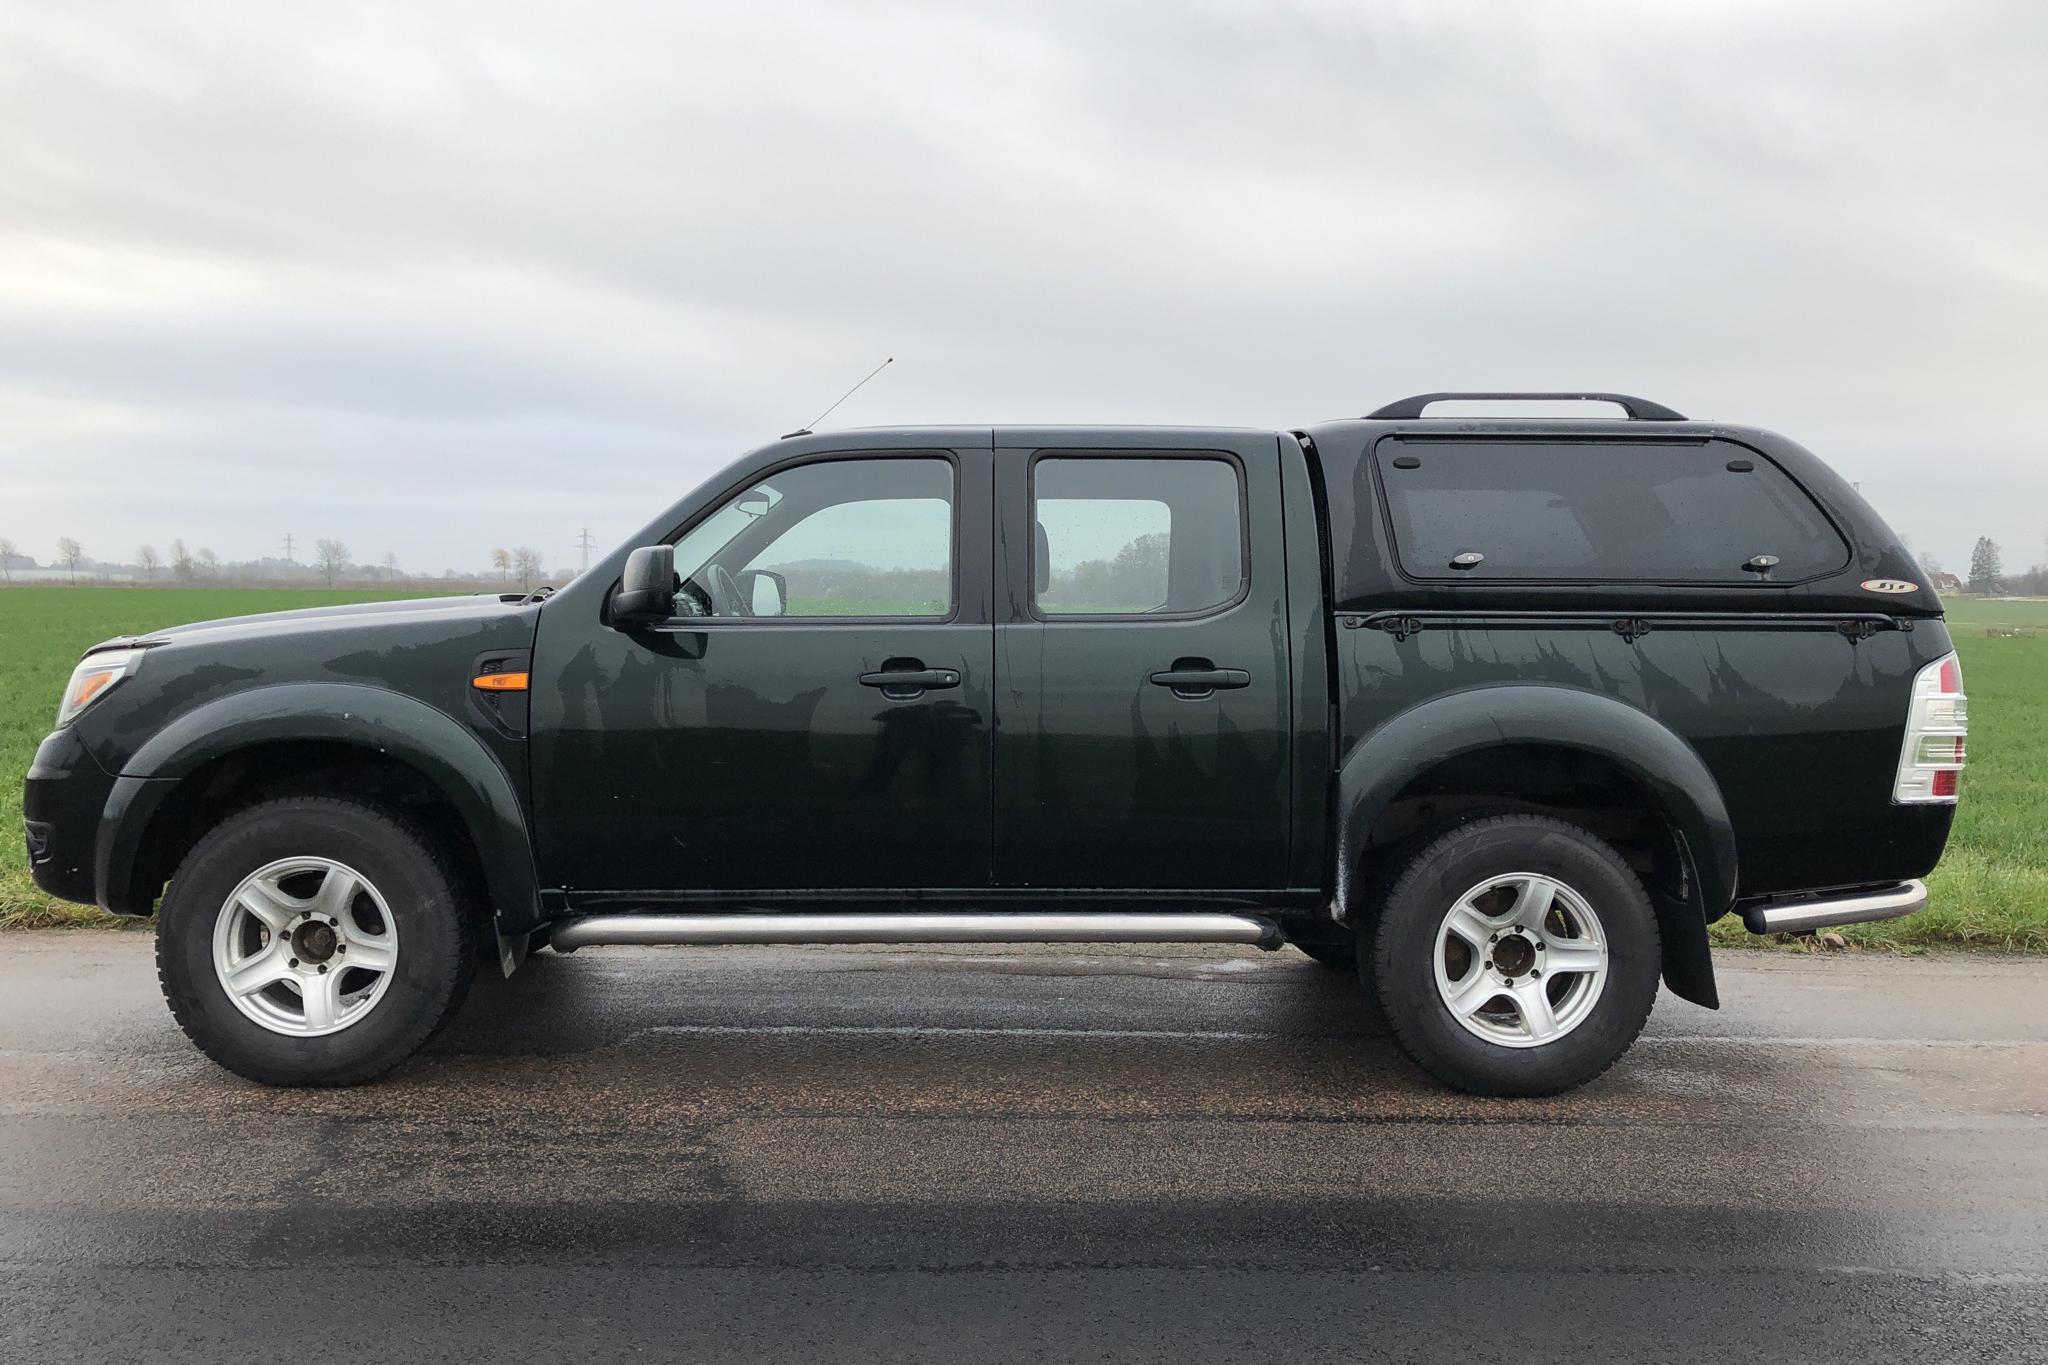 Ford Ranger 2.5 TDCi 4WD (143hk) - 171 180 km - Manual - green - 2011